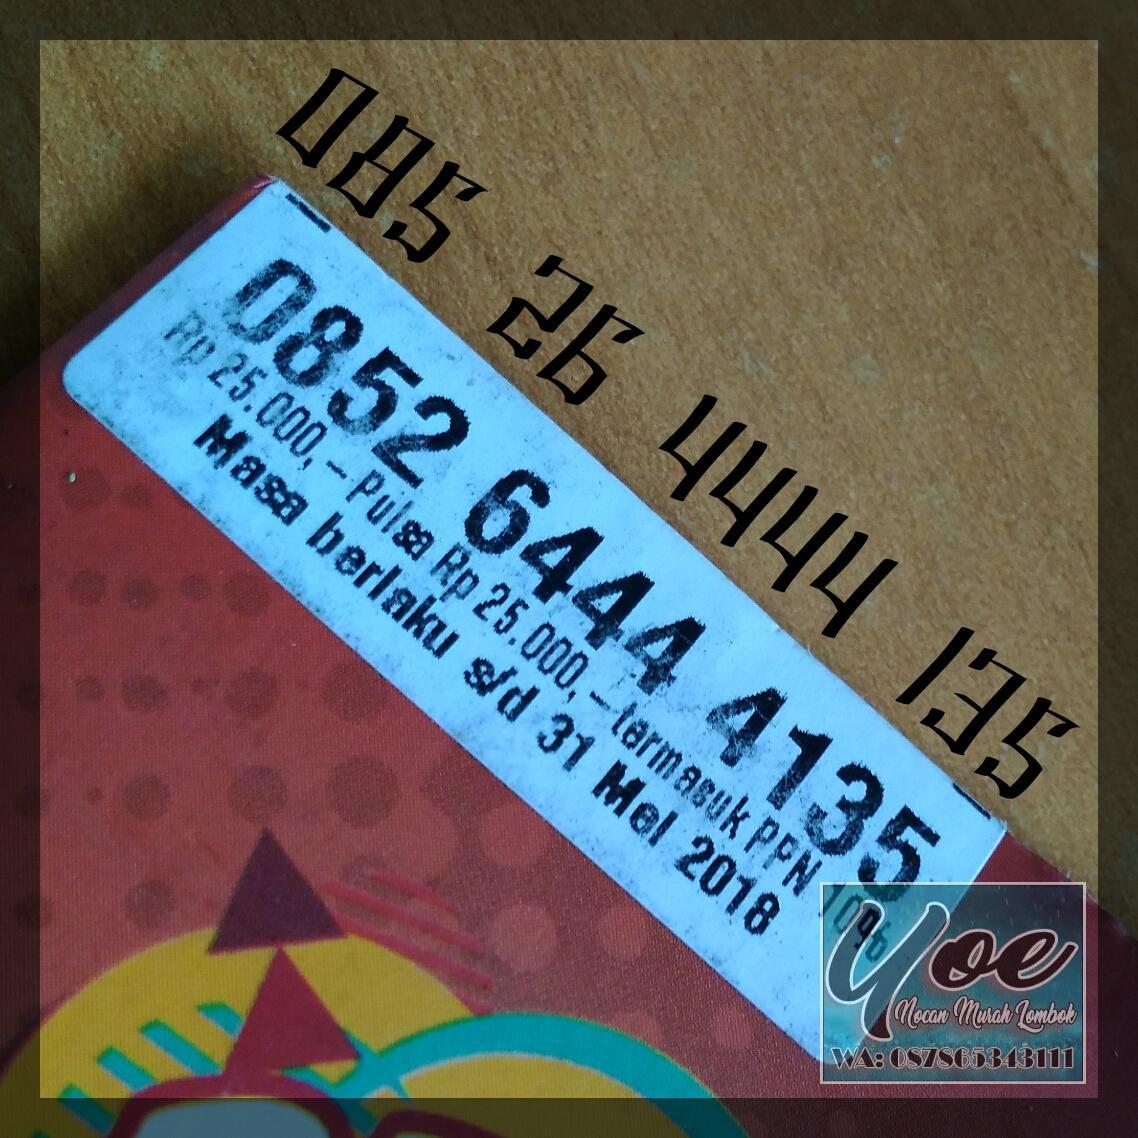 Nomor Cantik AS Kuartet 4444